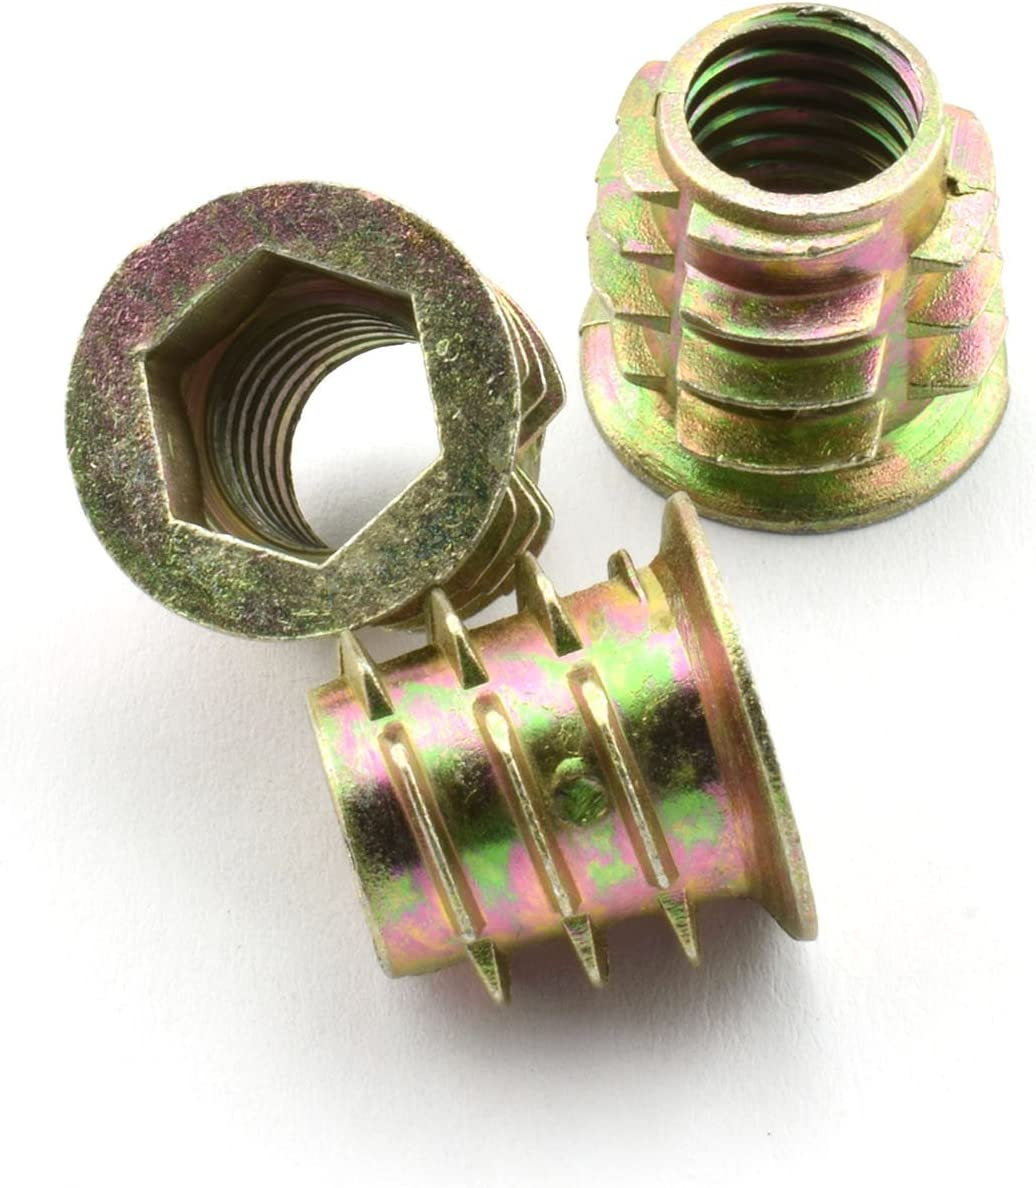 "LQ Industrial 30pcs 15.3x15mm Furniture Screw-in Nut Zinc Alloy Bolt Fastener Connector Hex Socket Drive Threaded Insert Nuts for Wood Furniture Assortment 3/8""-16"